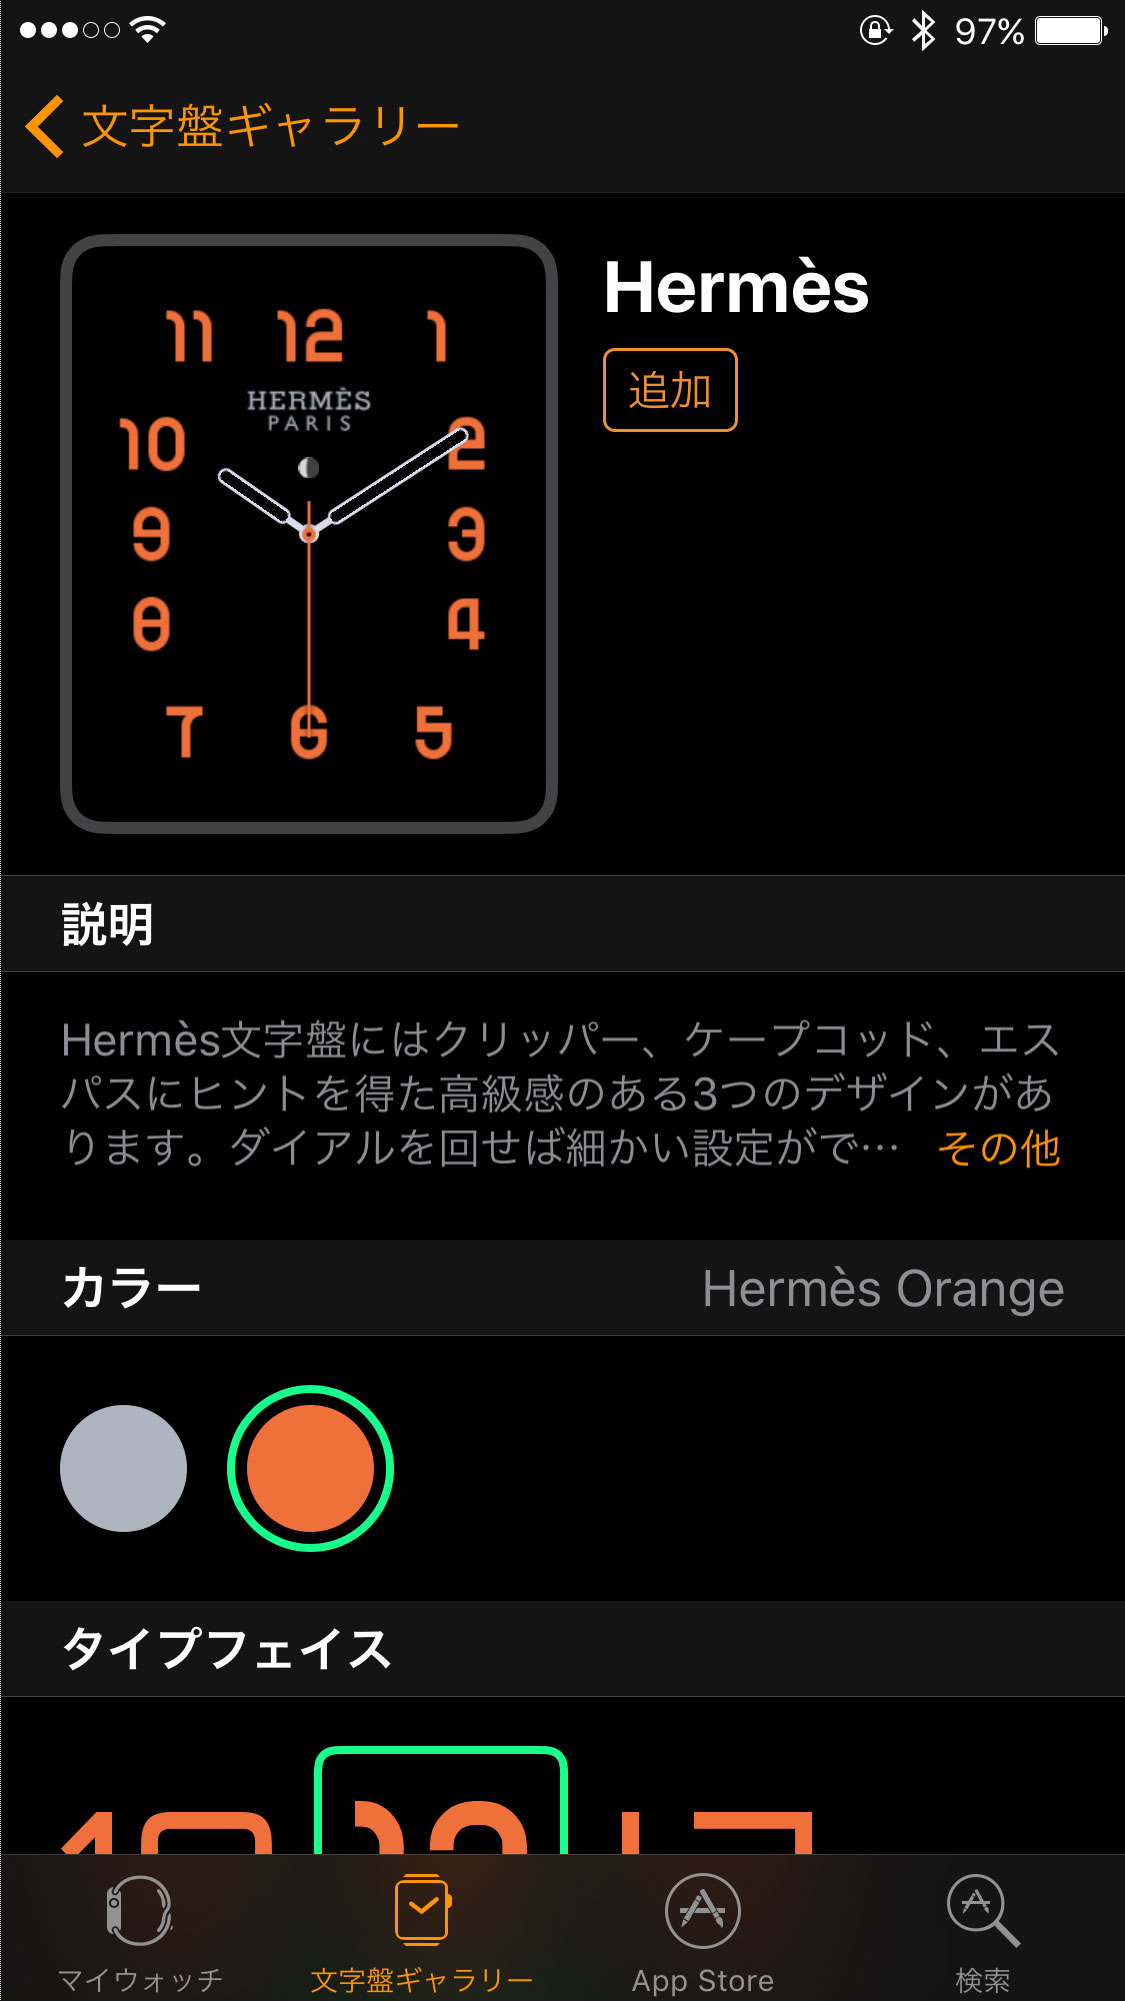 Specialfaces コラボ版専用の文字盤を通常のapple Watchでも使用可能に Jbapp Tools 4 Hack